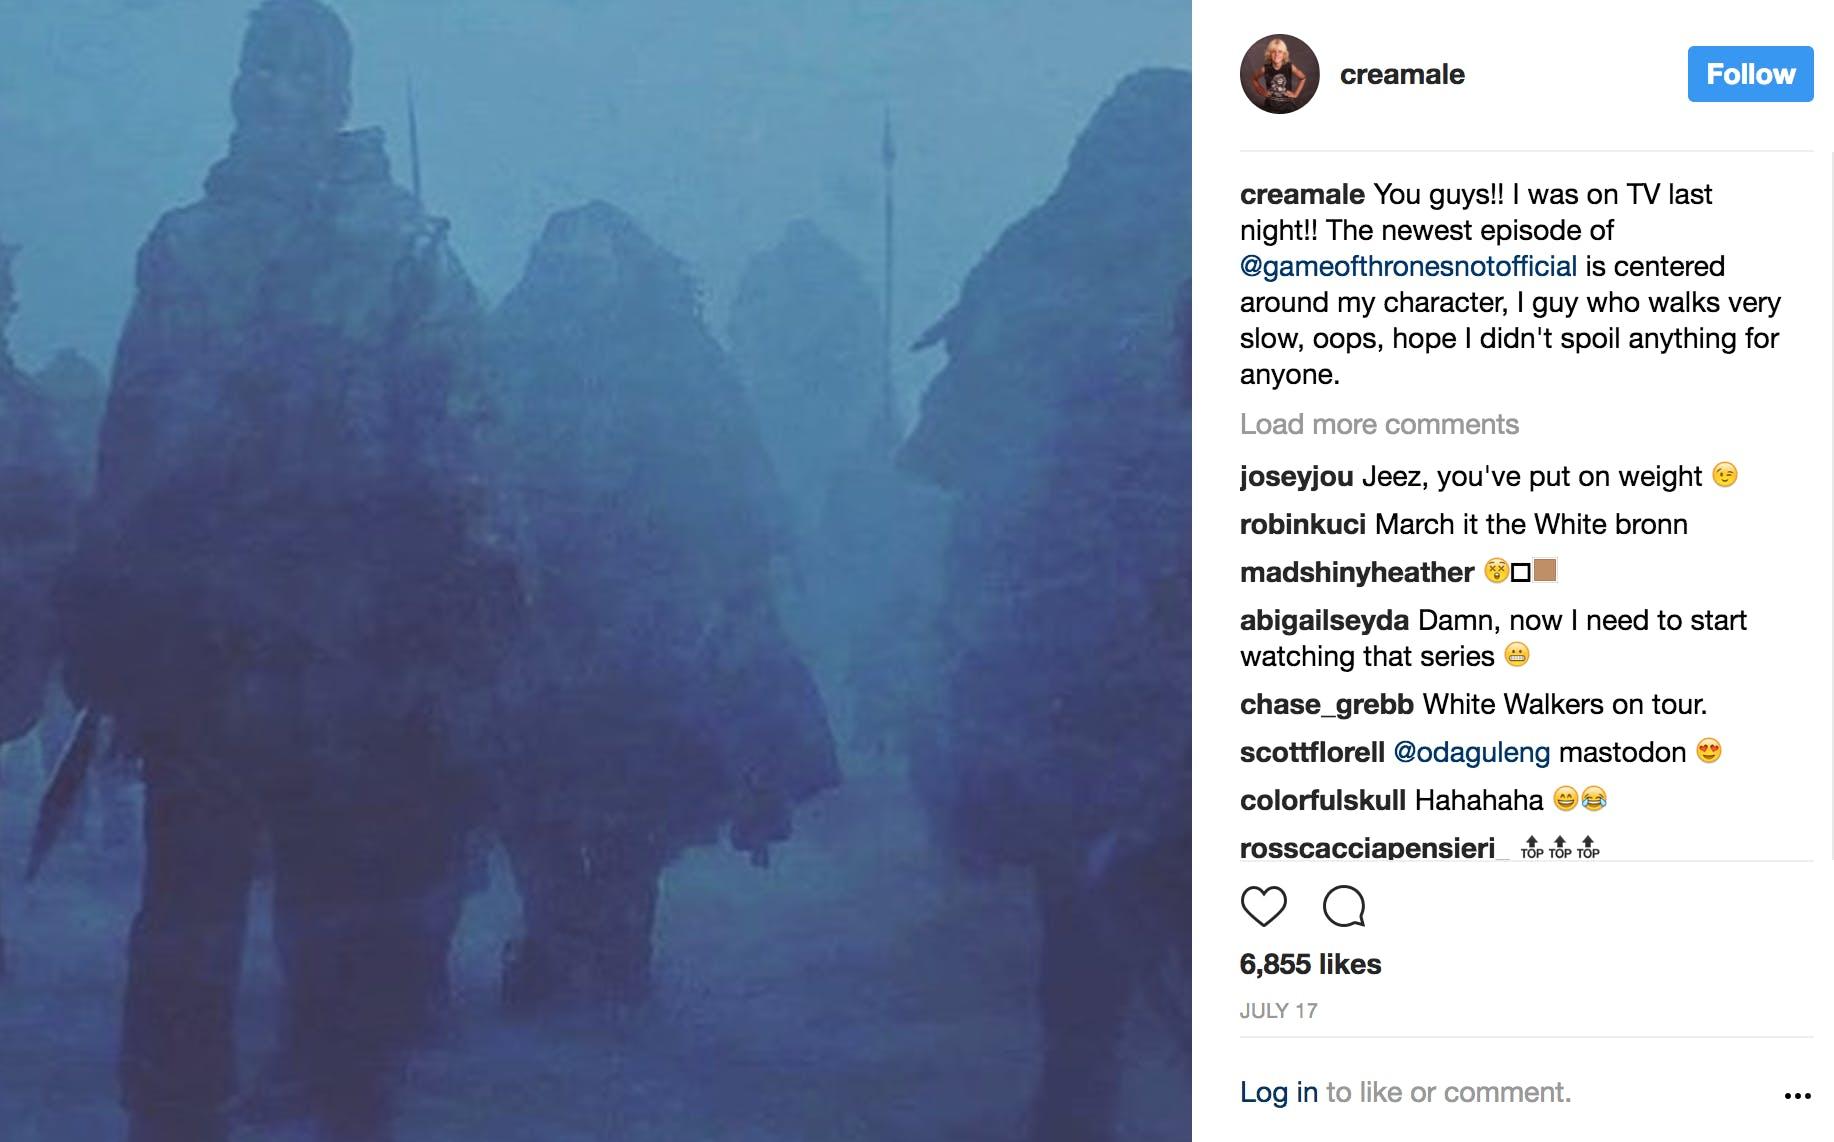 Brann Dailor on Game of Thrones